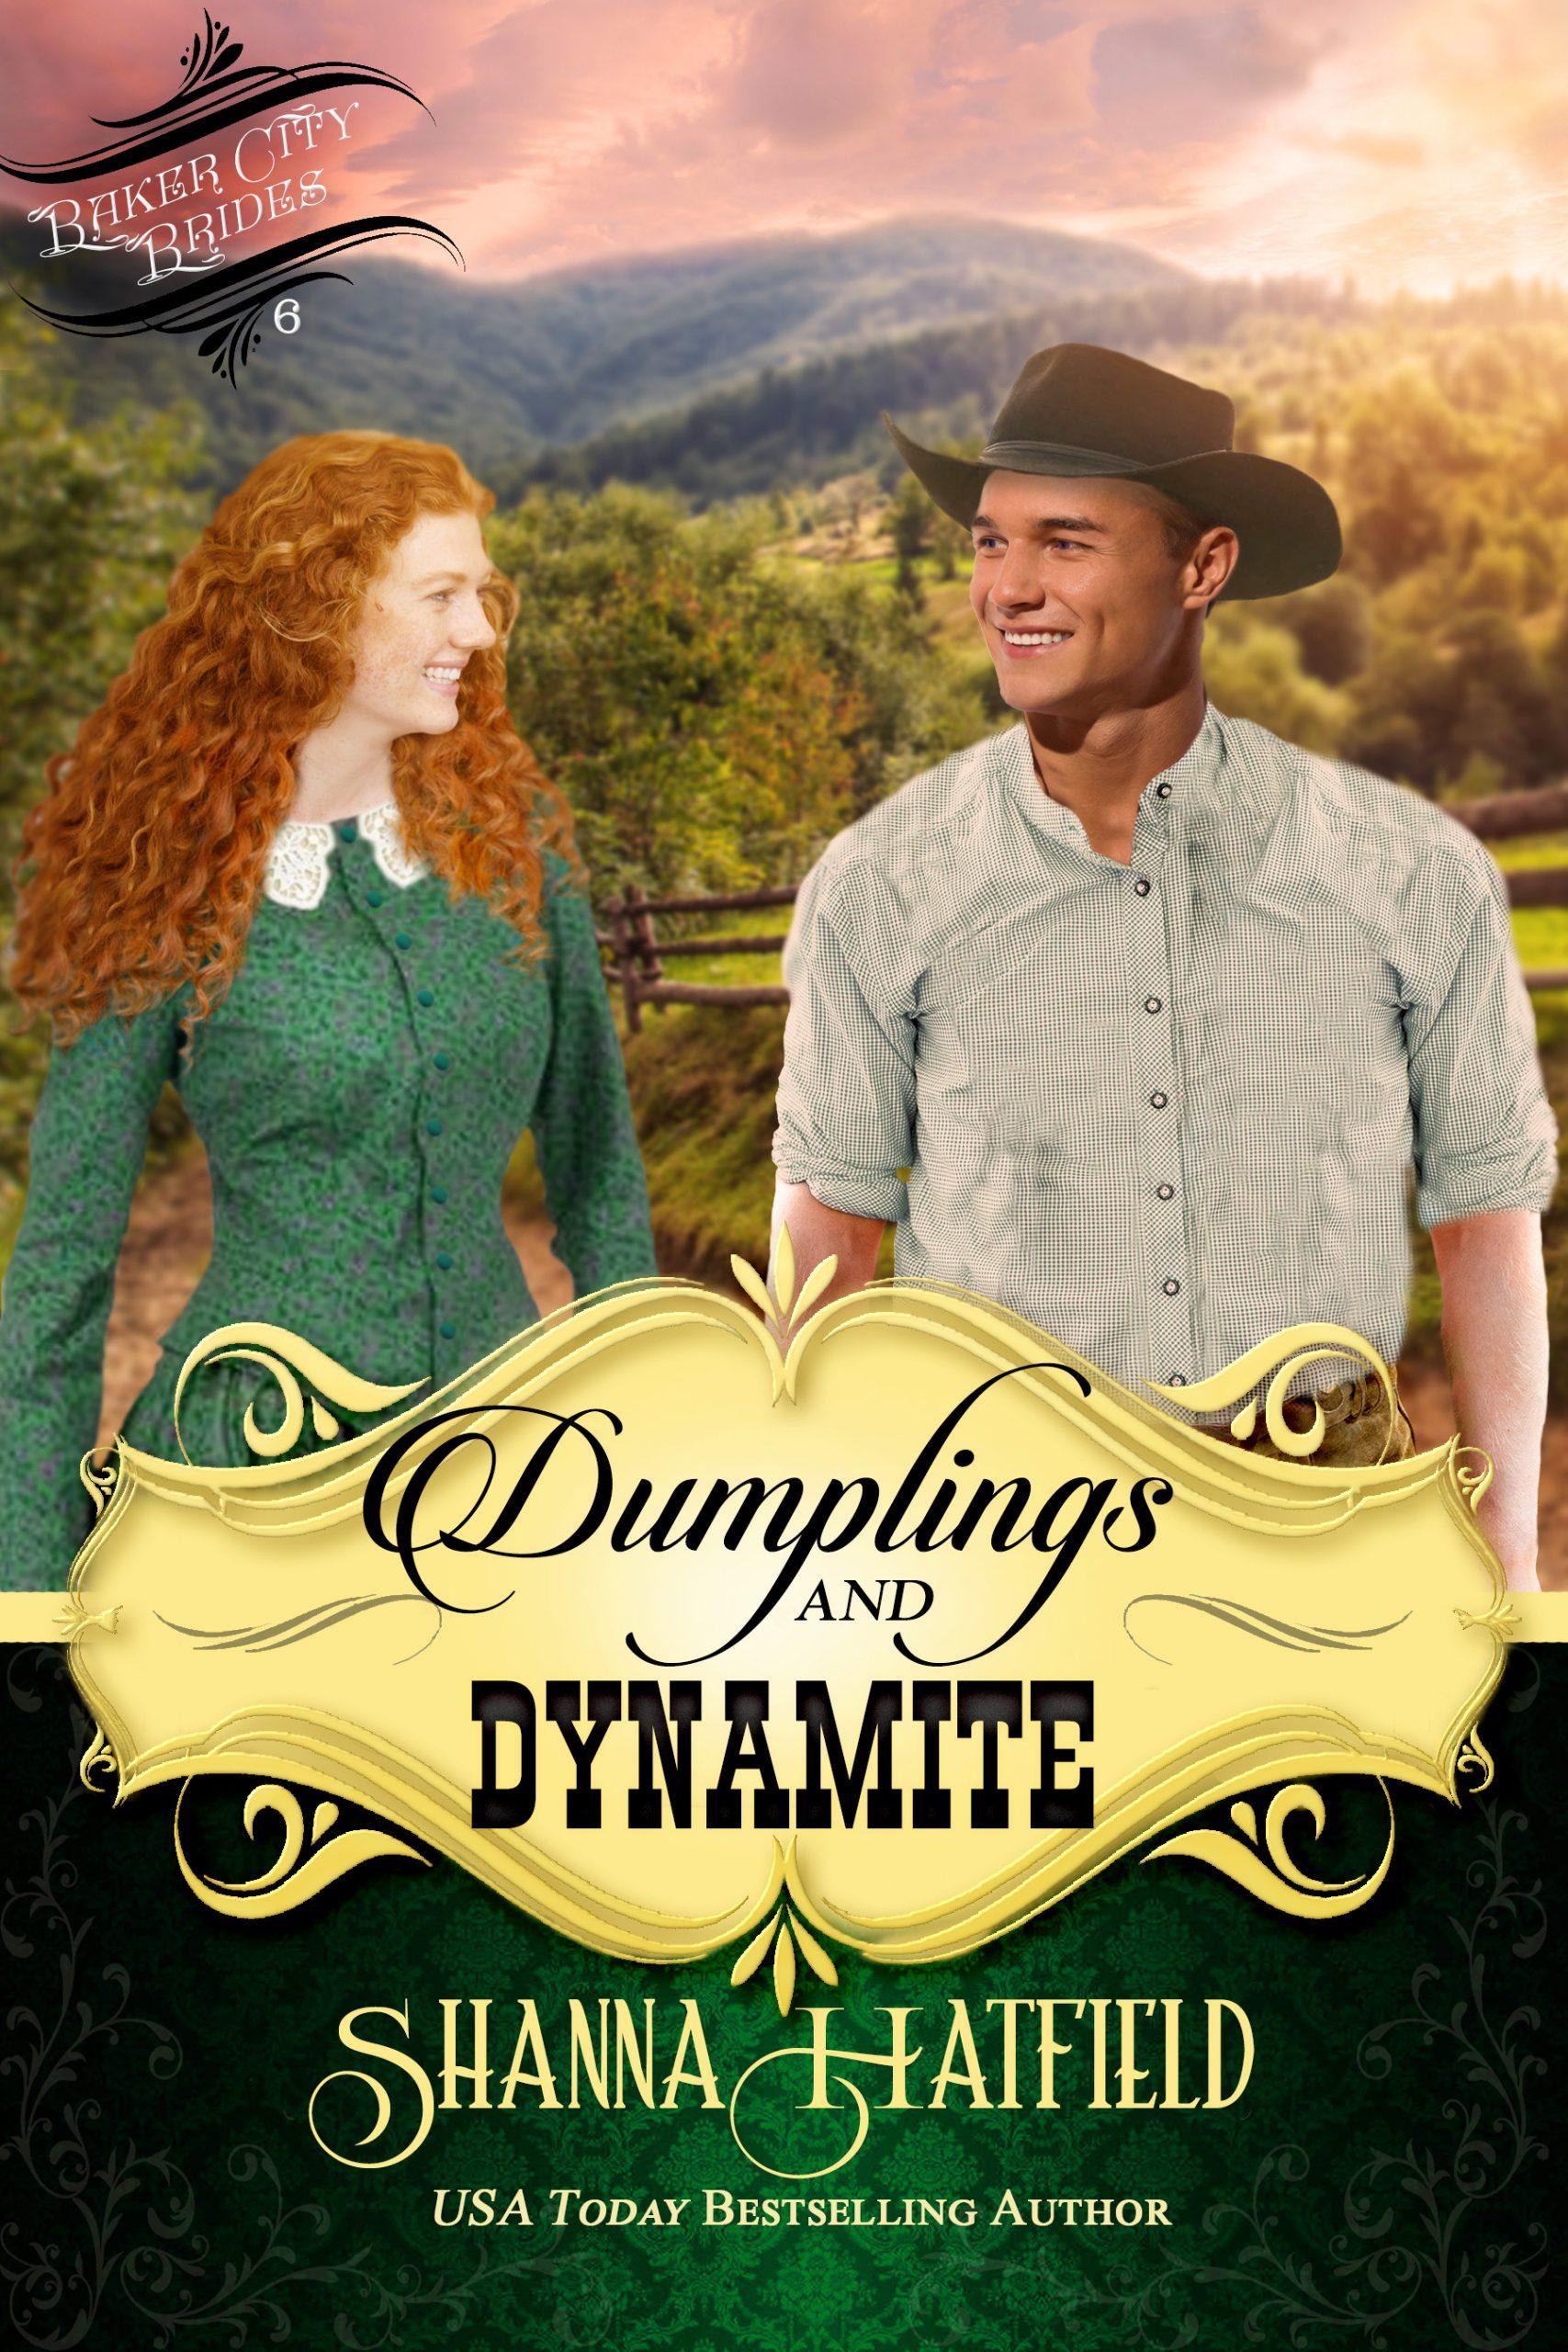 Dumplings and Dynamite